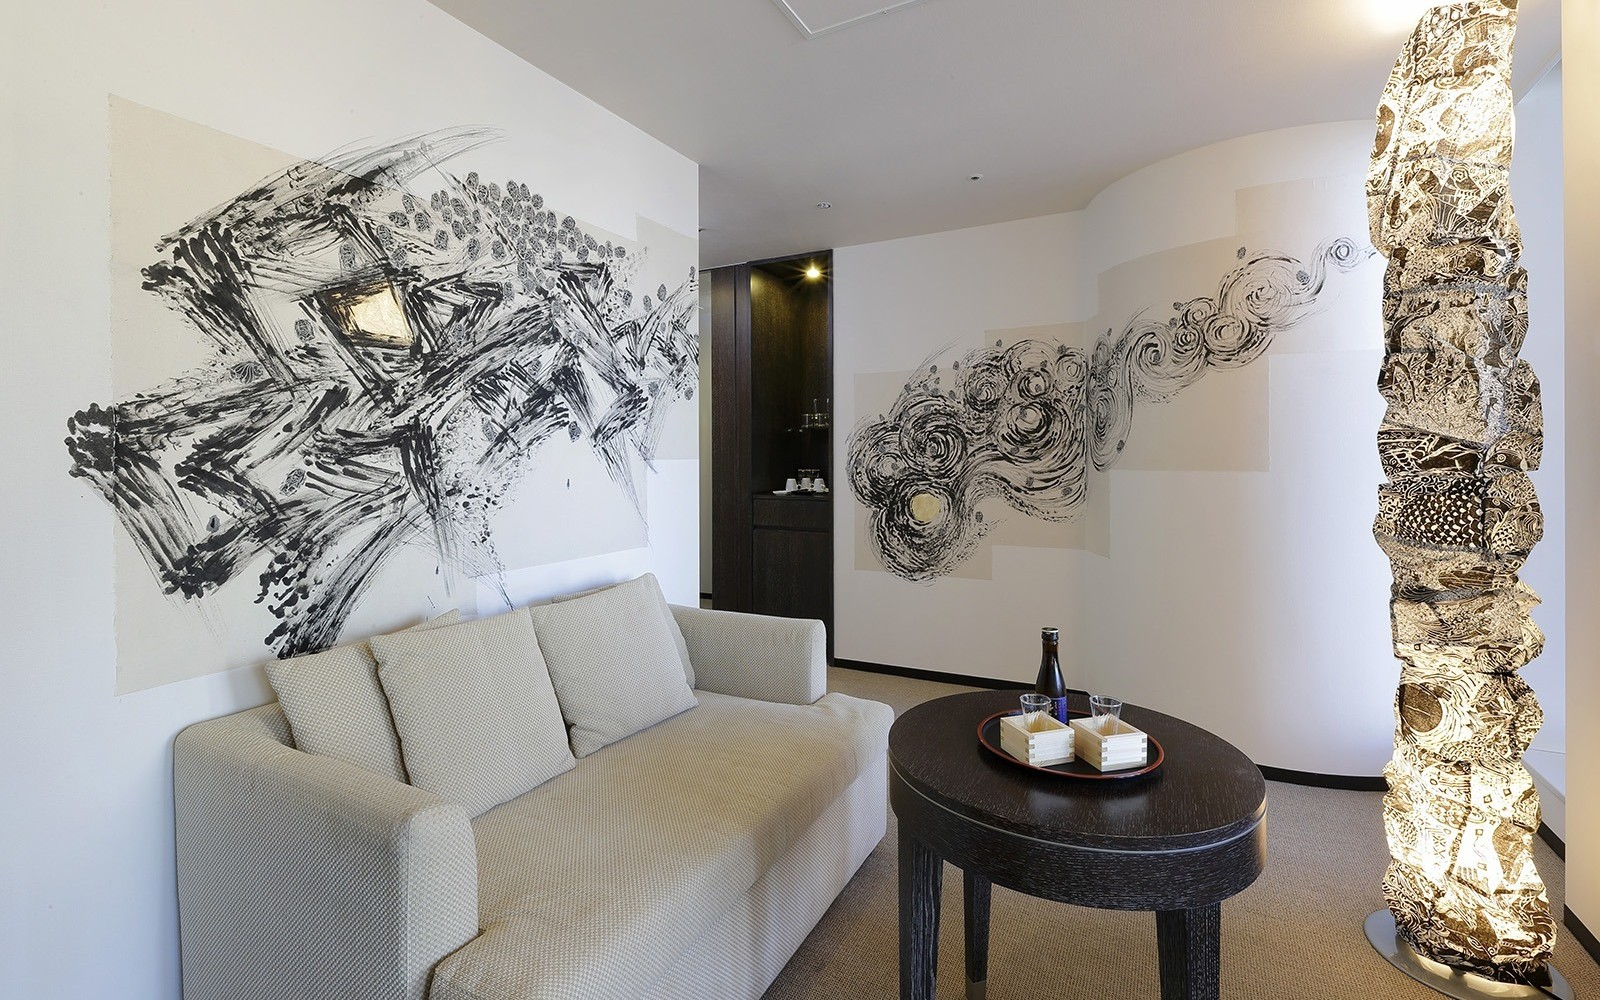 Parkhoteltokyo artist room king washi2 tokyo 1600x1000